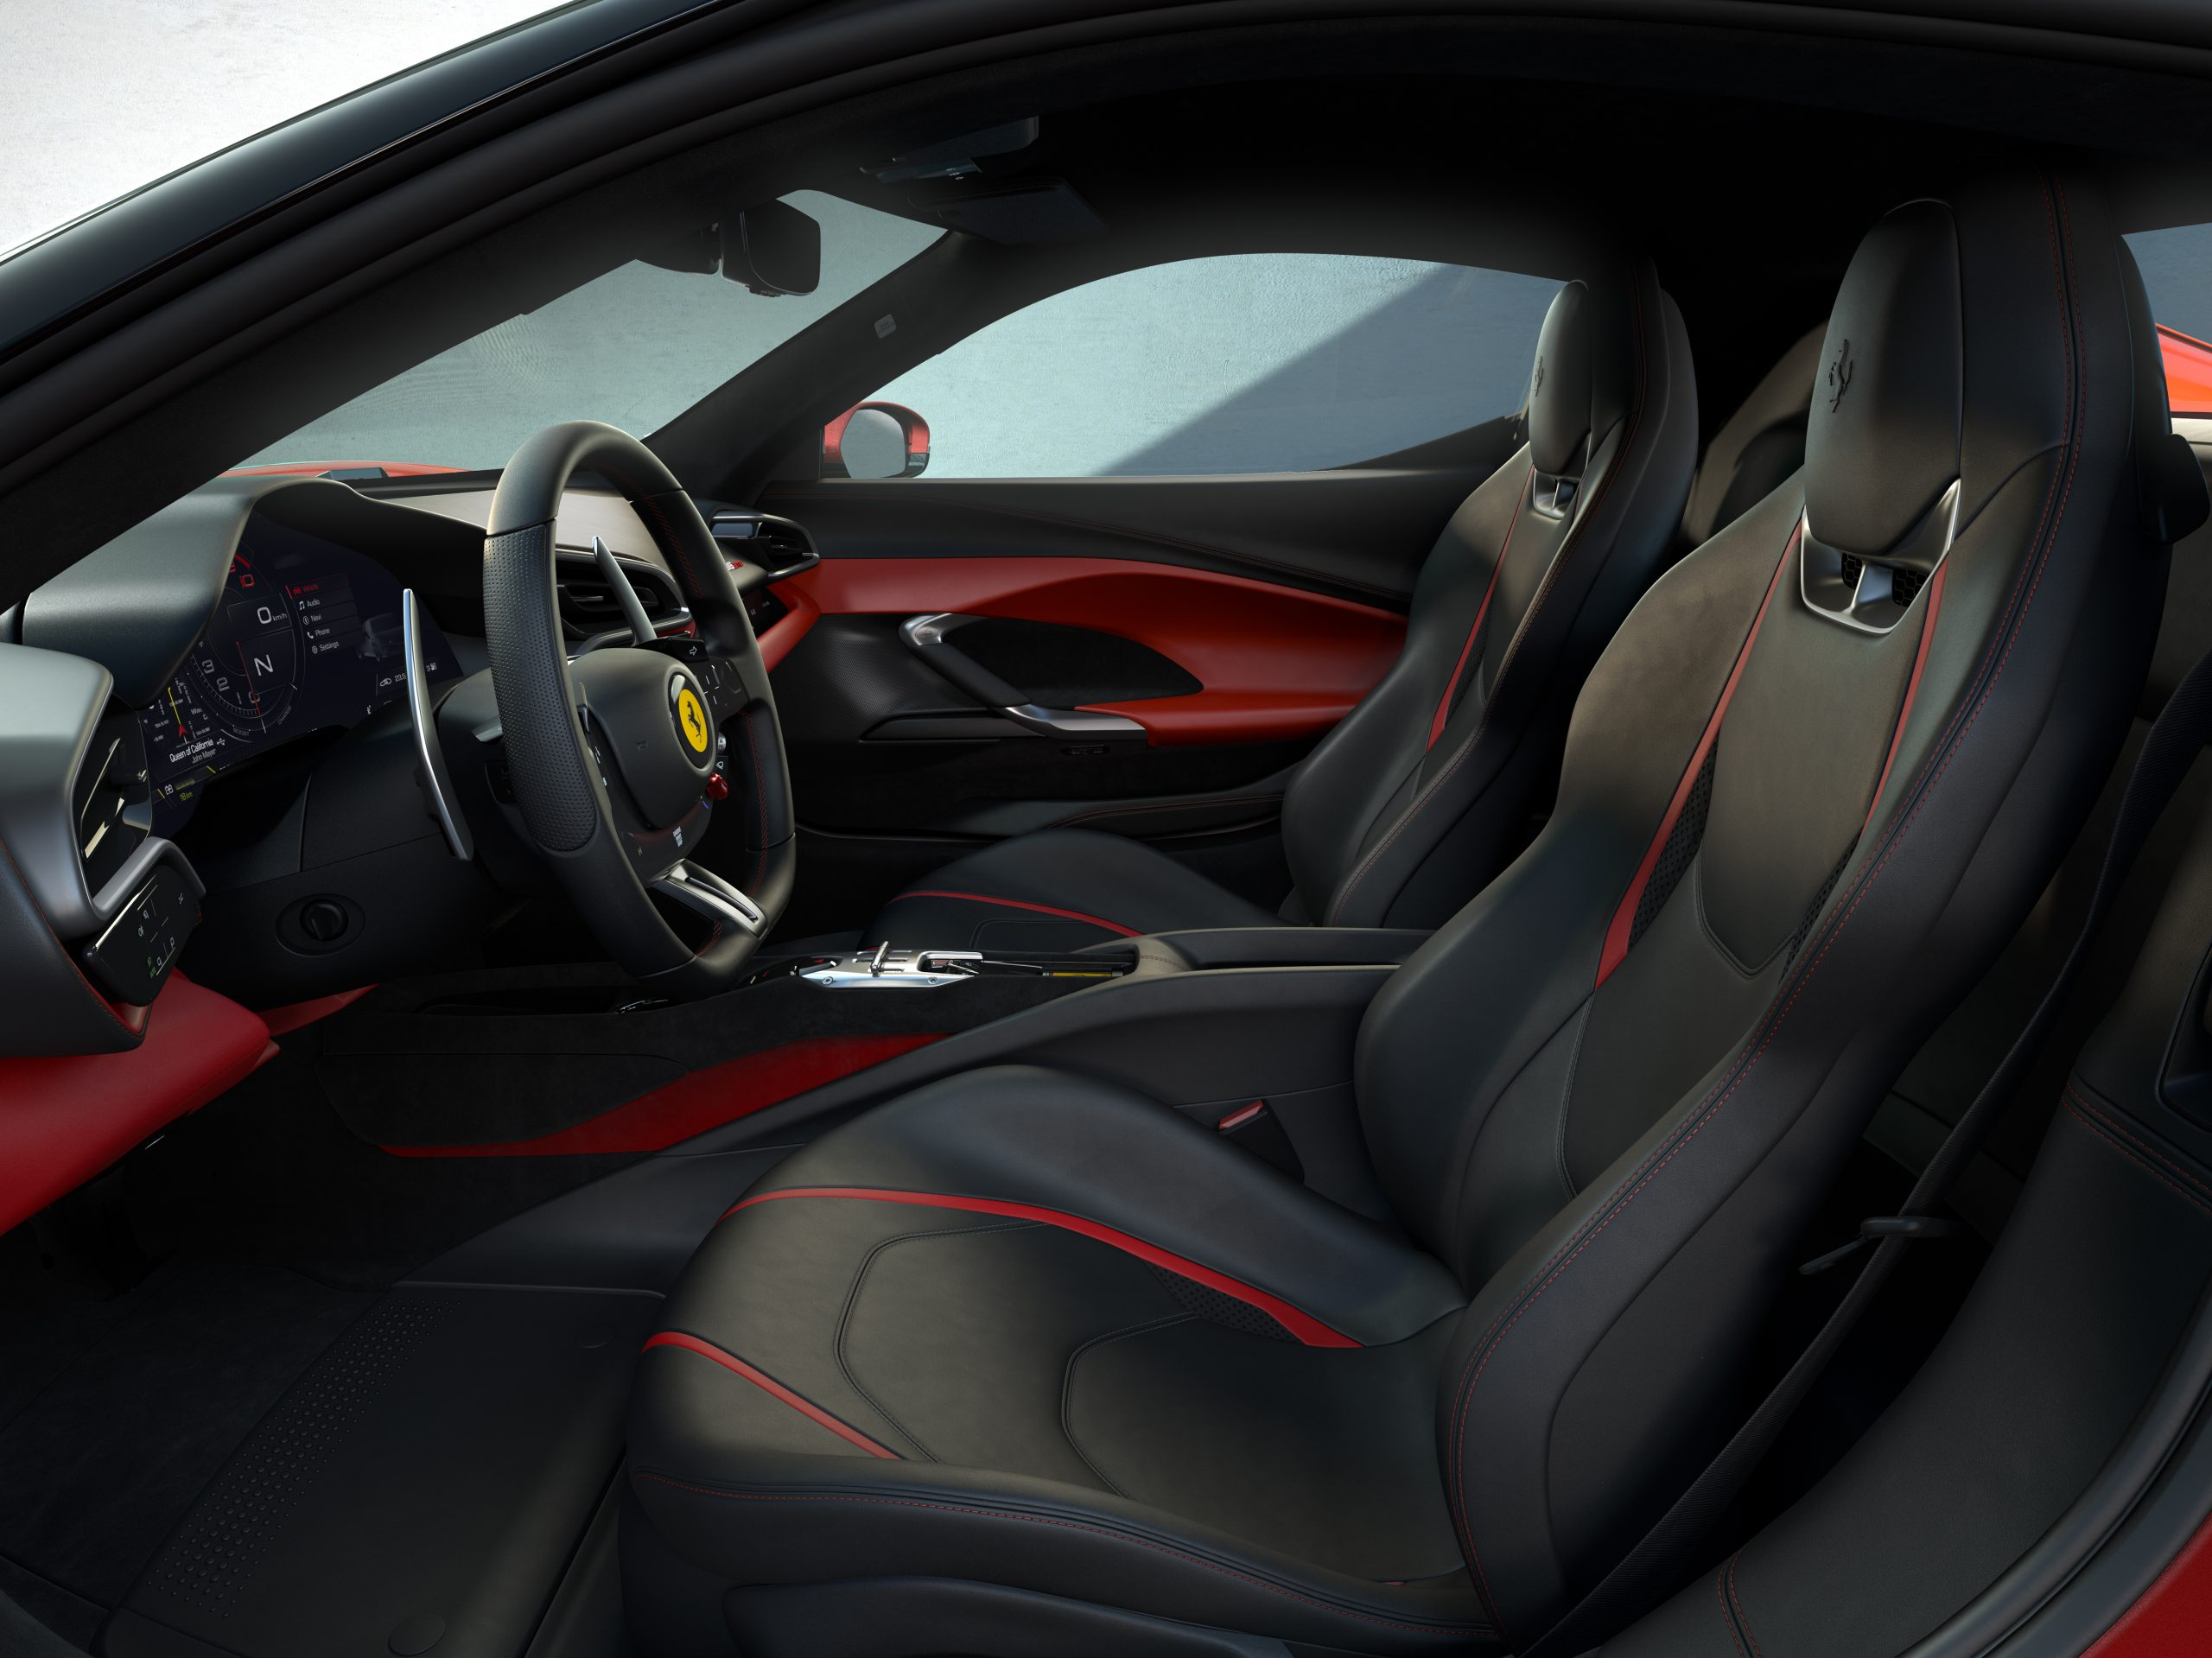 03 296 GTB Interior side scaled Αυτή είναι η νέα Ferrari 296GTB 296GTB, Ferrari, Ferrari 296GTB, supercar, supercars, zblog, ειδήσεις, Νέα